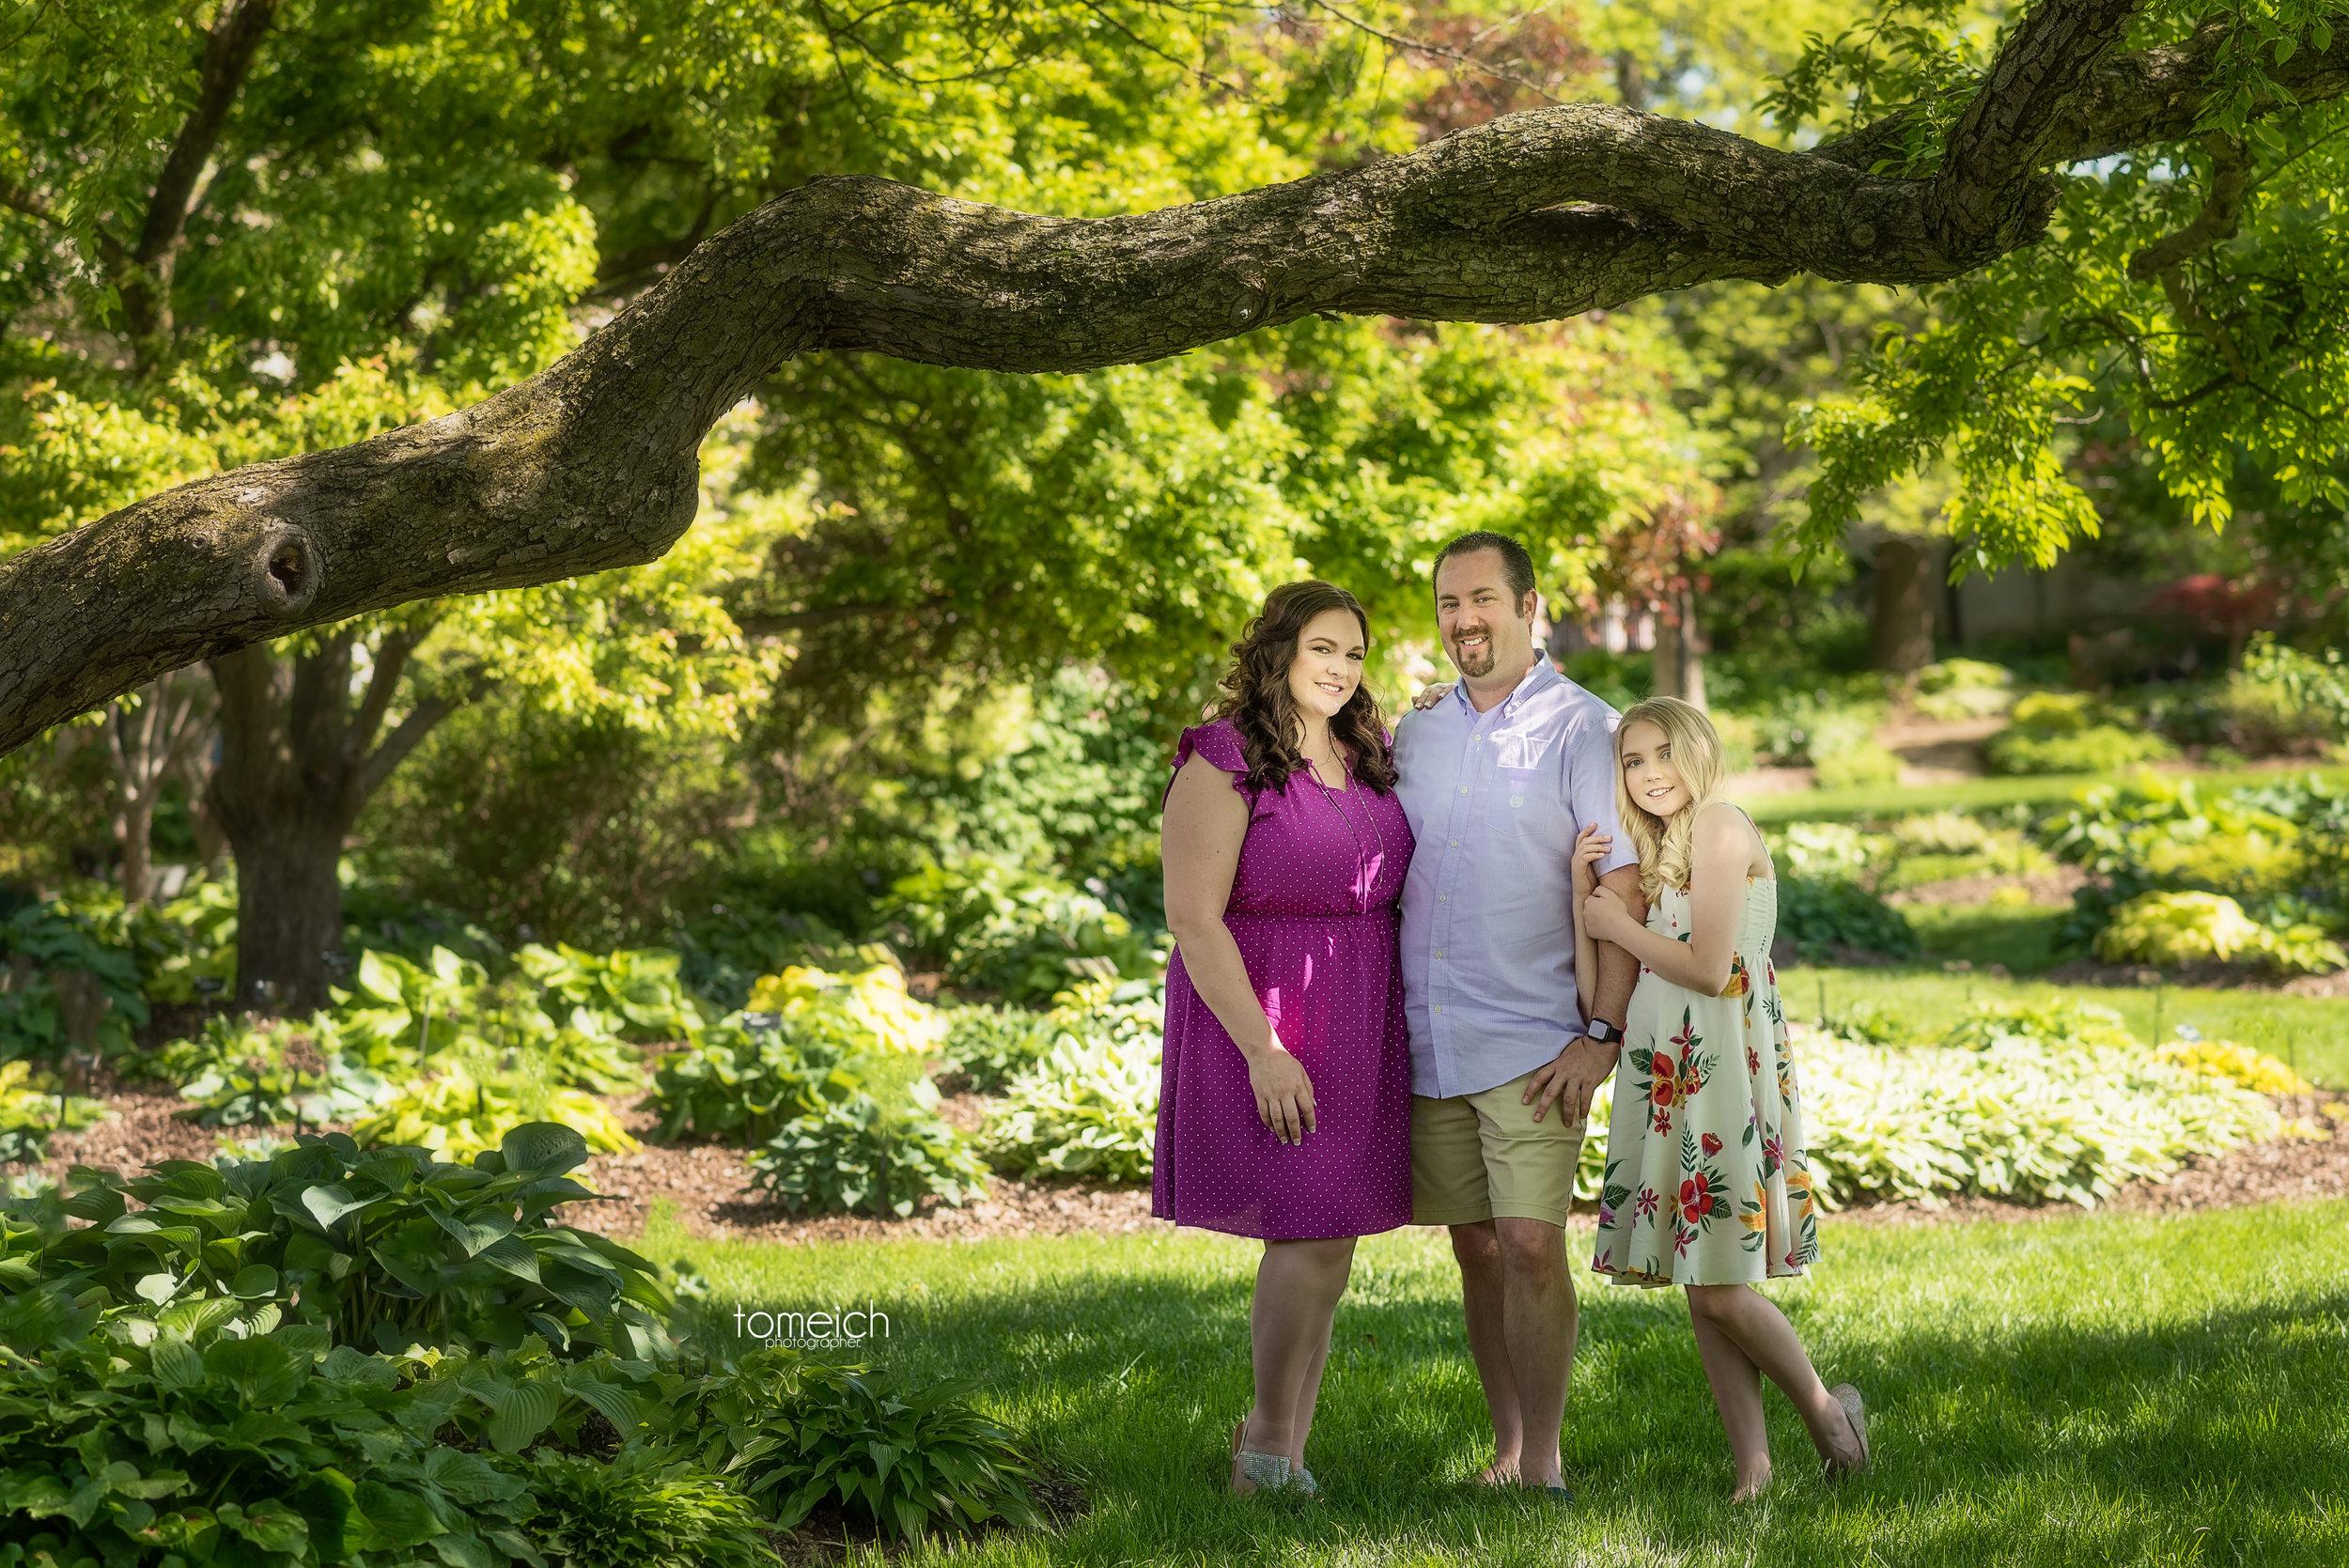 stl botanical garden engagement-0002.jpg